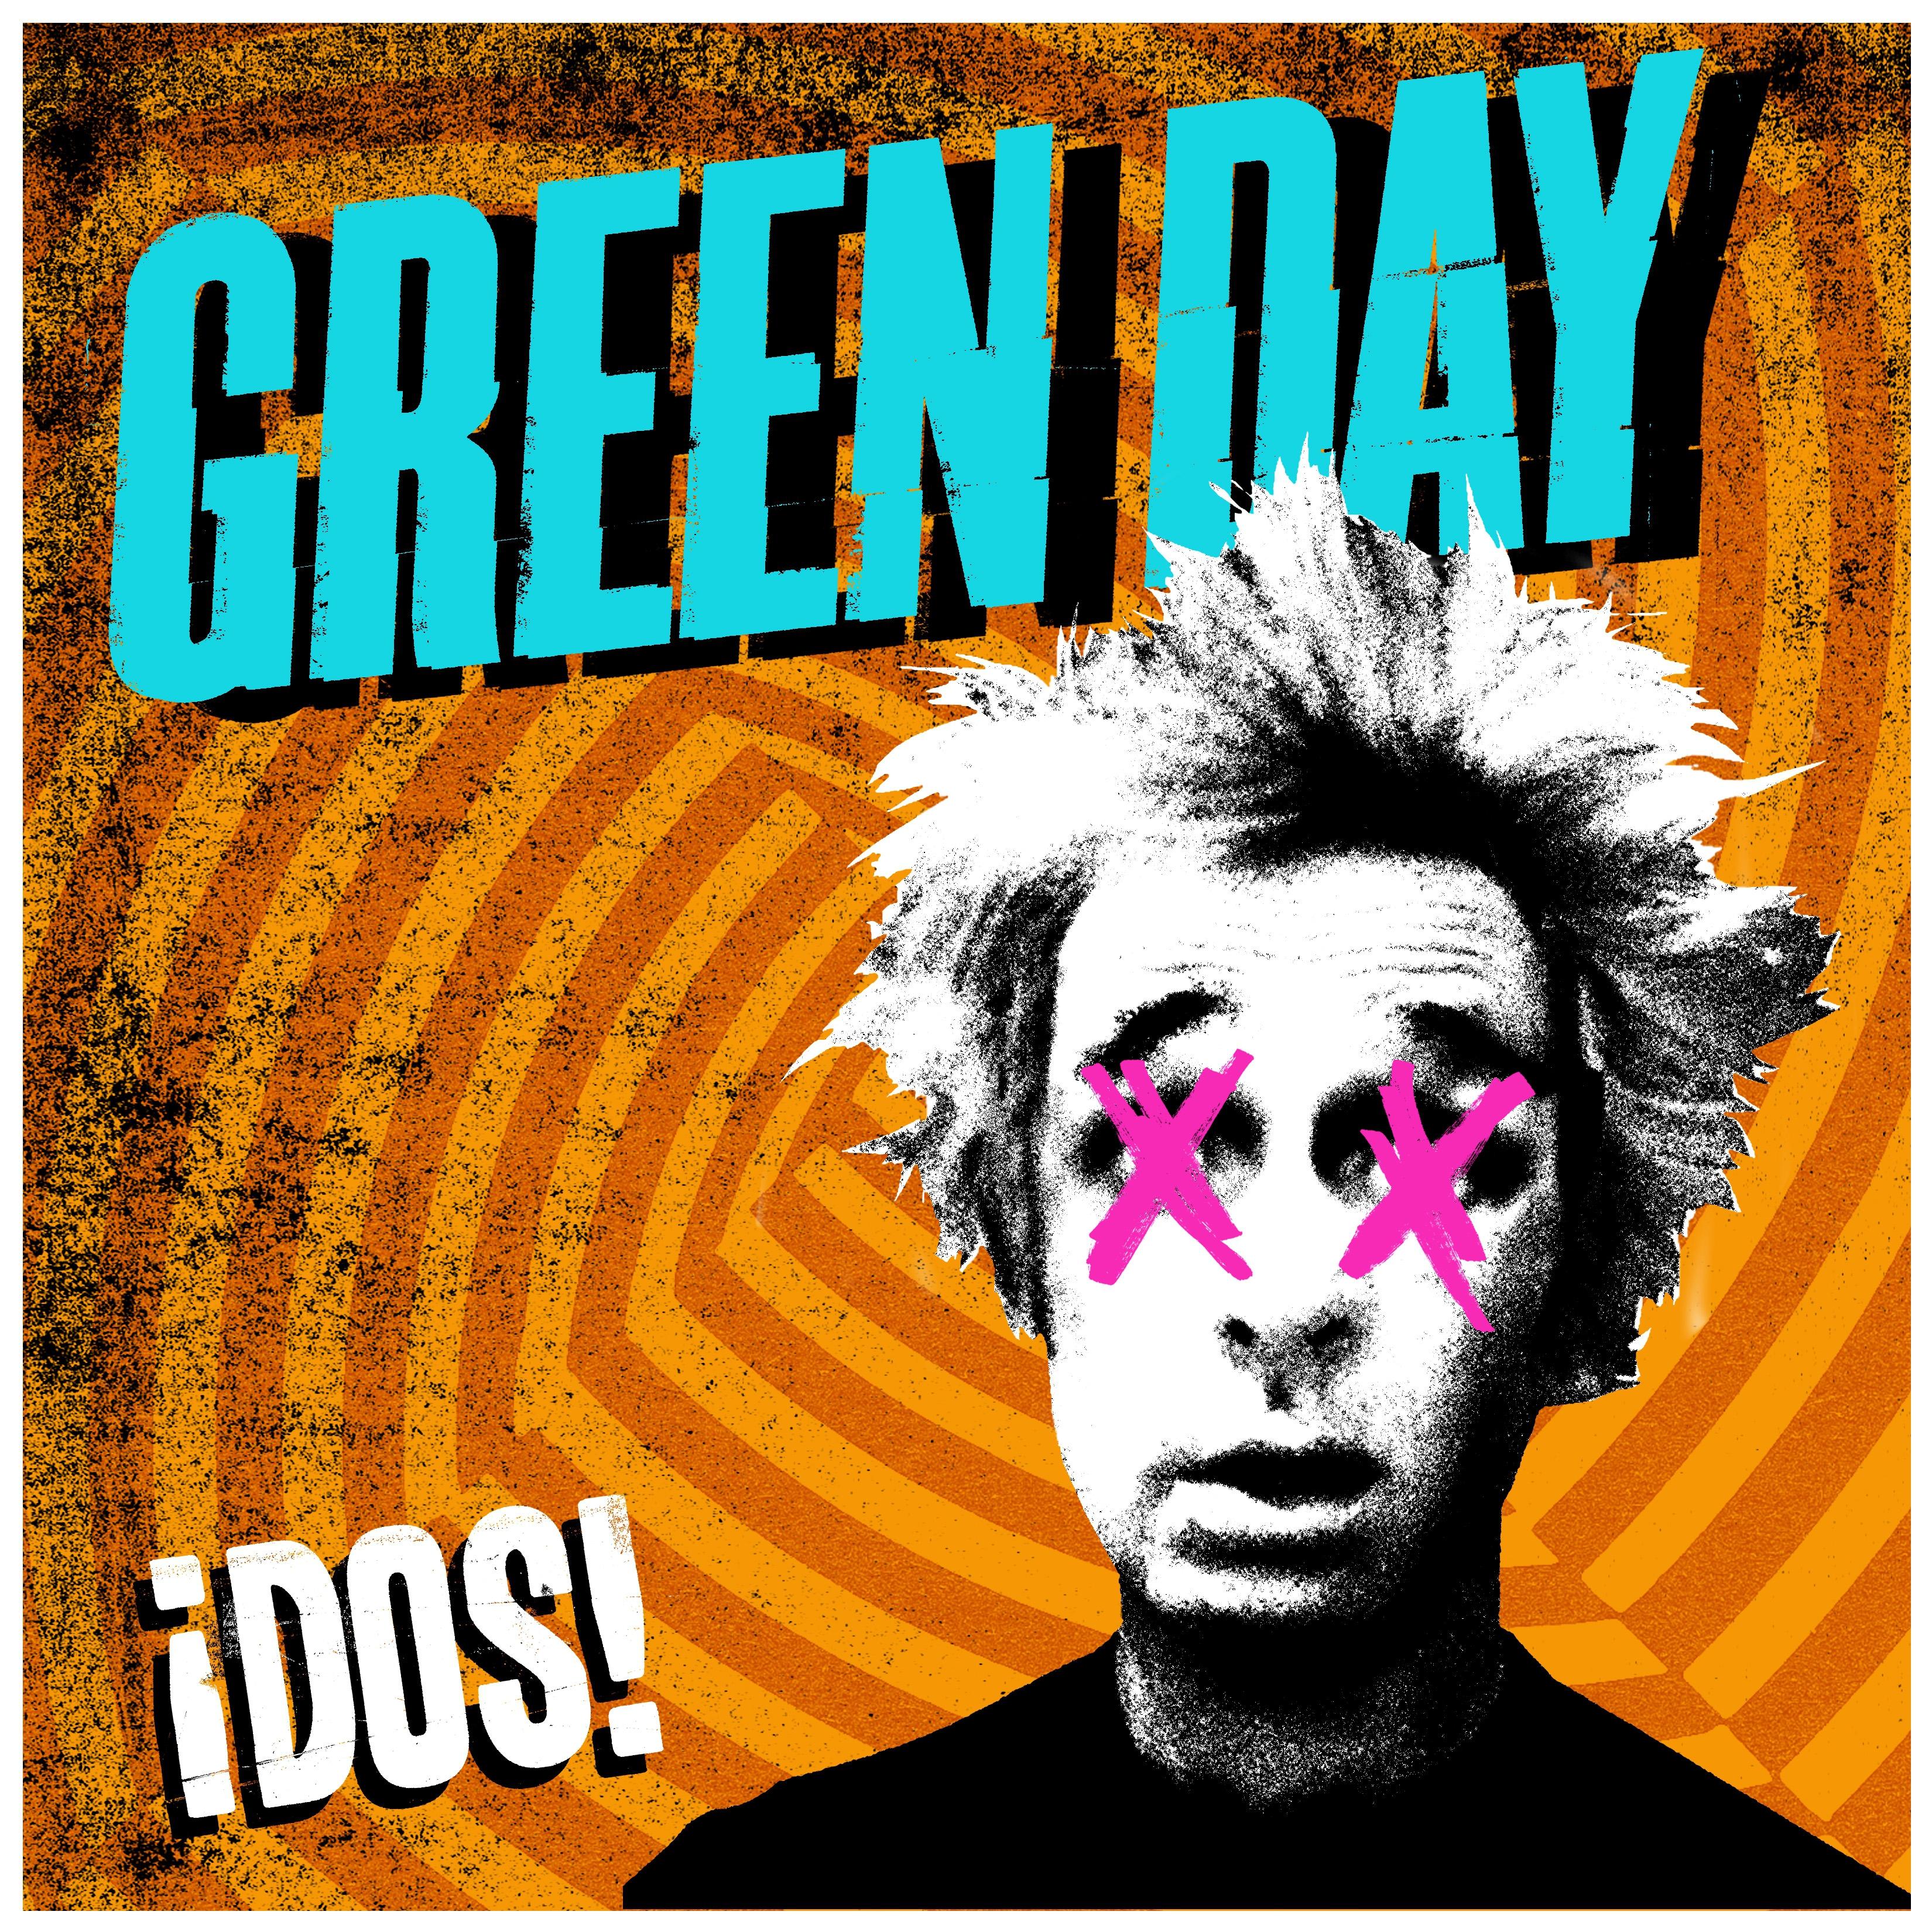 Green Day Hd Wallpaper